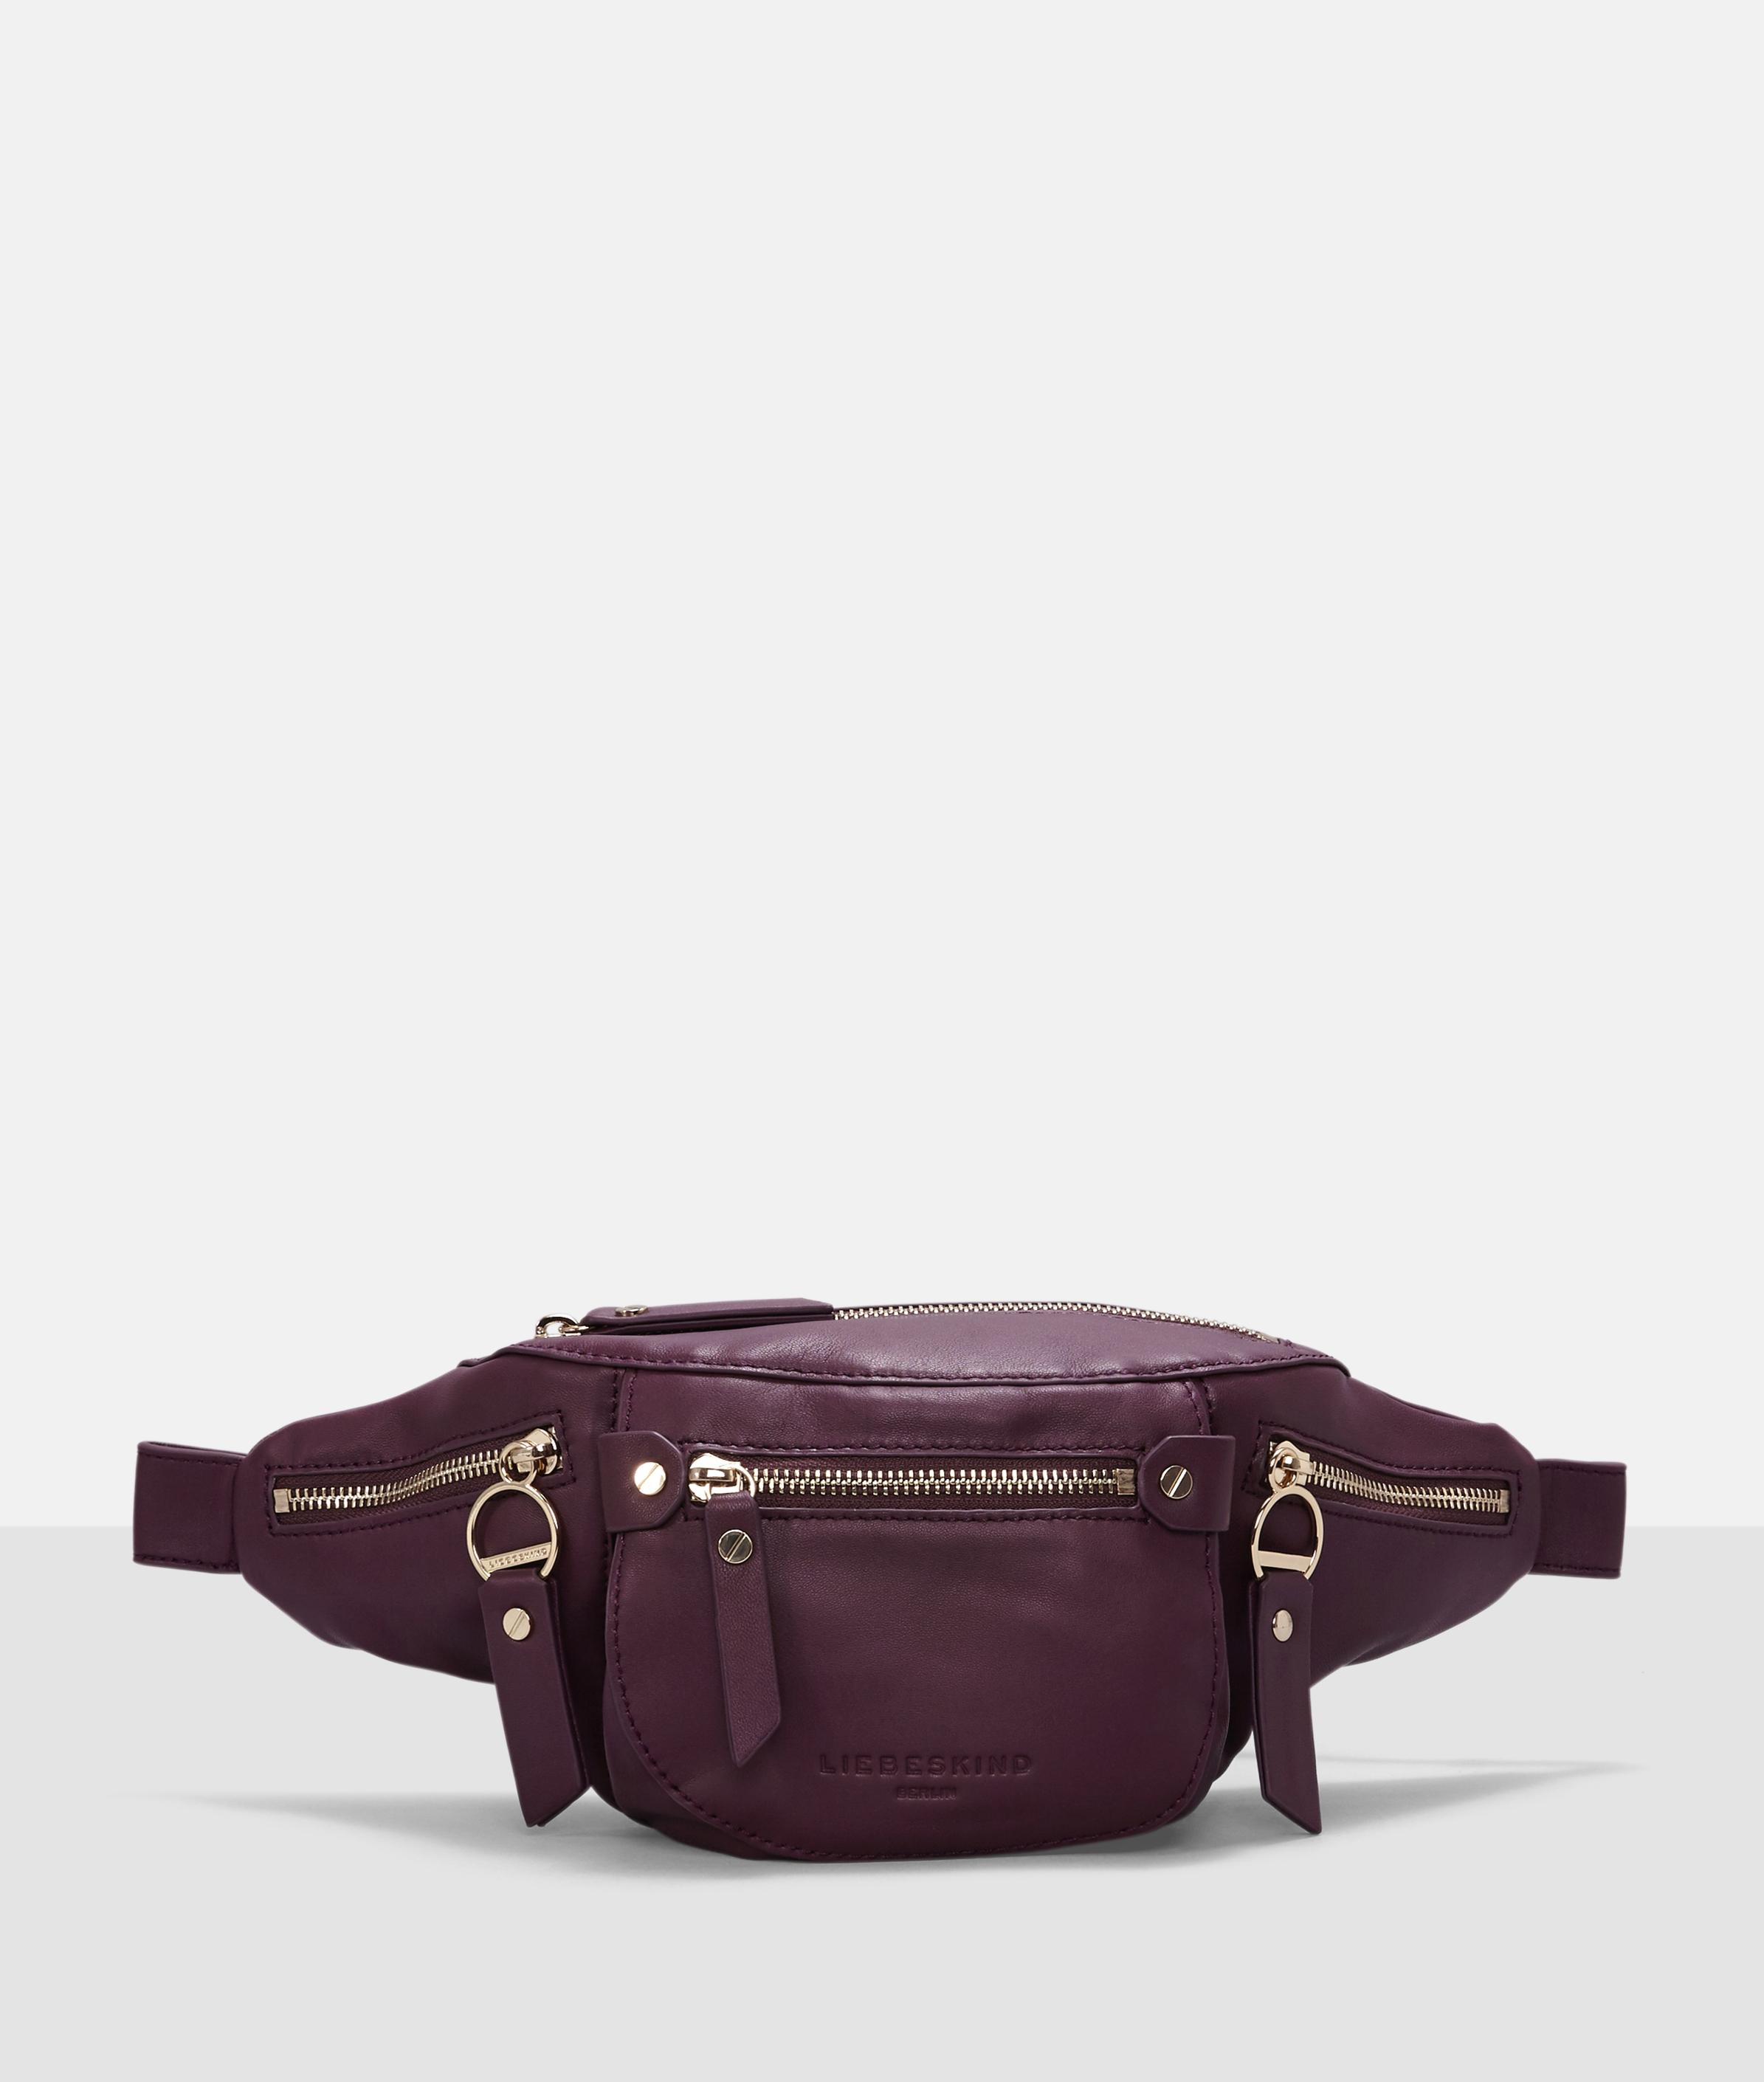 liebeskind berlin - Tasche Fanny Pack Belt Bag, Pink